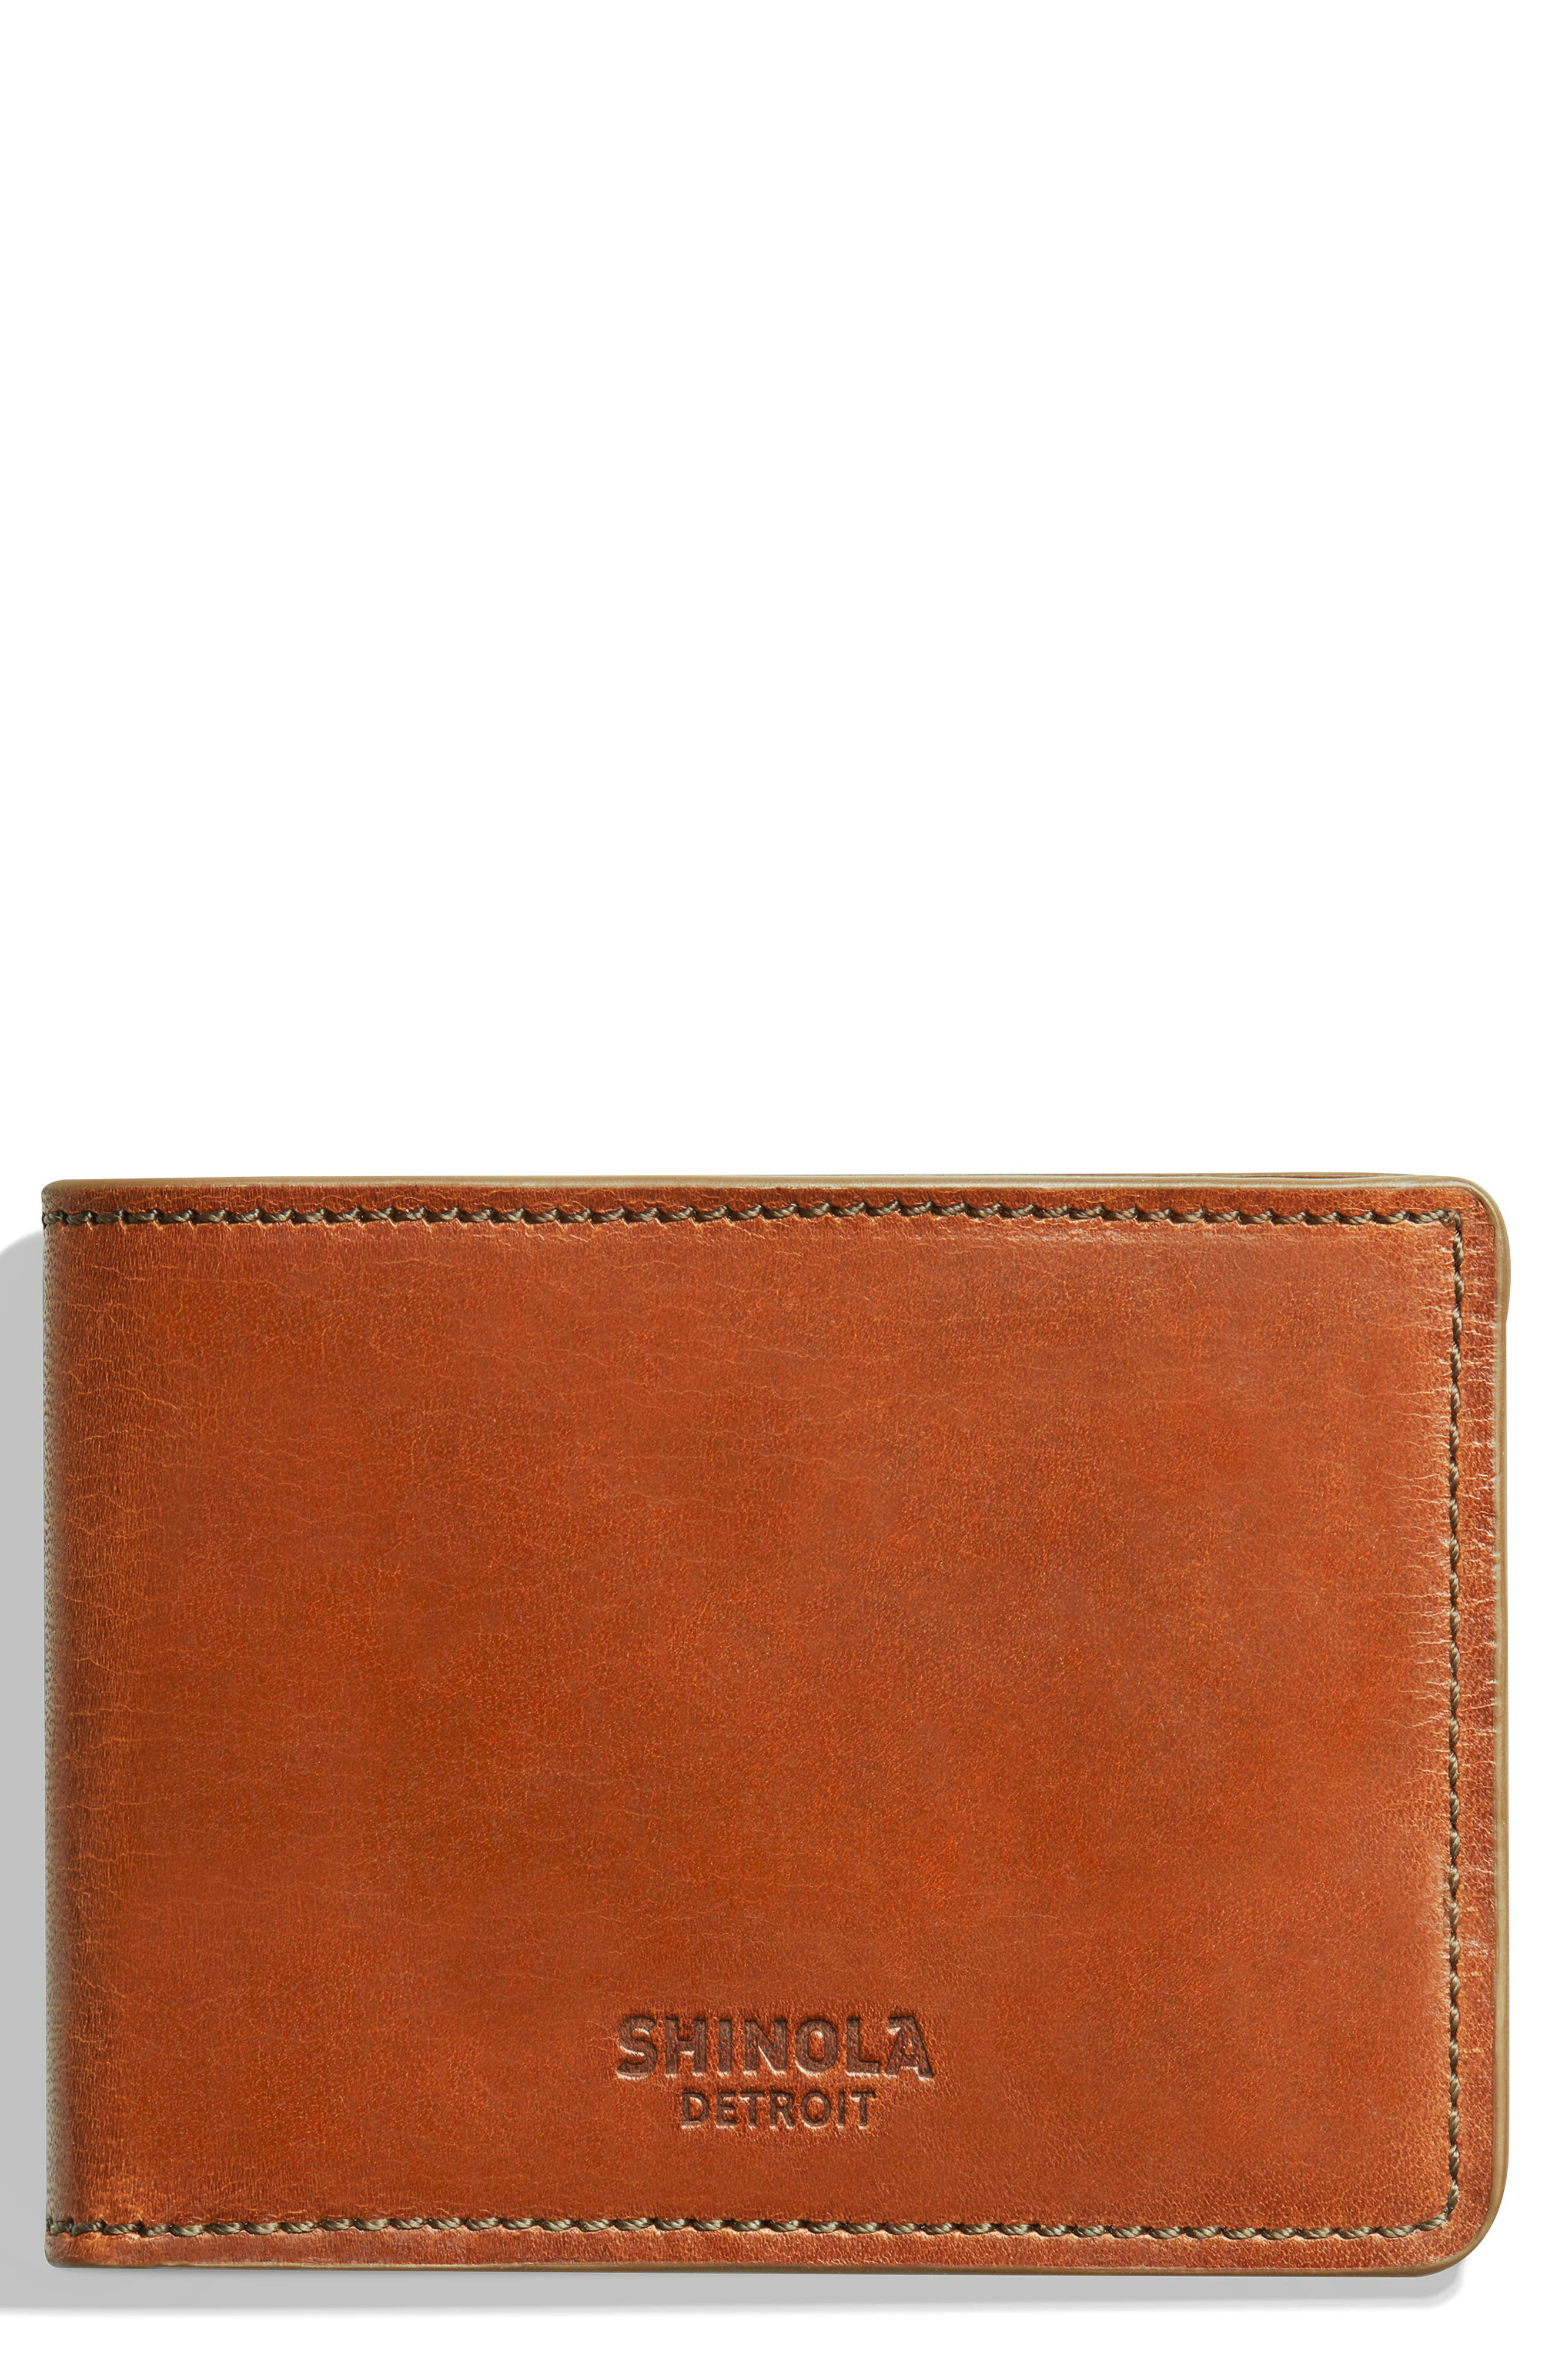 Harness Slim 2.0 Bifold Leather Wallet,                         Main,                         color, BOURBON